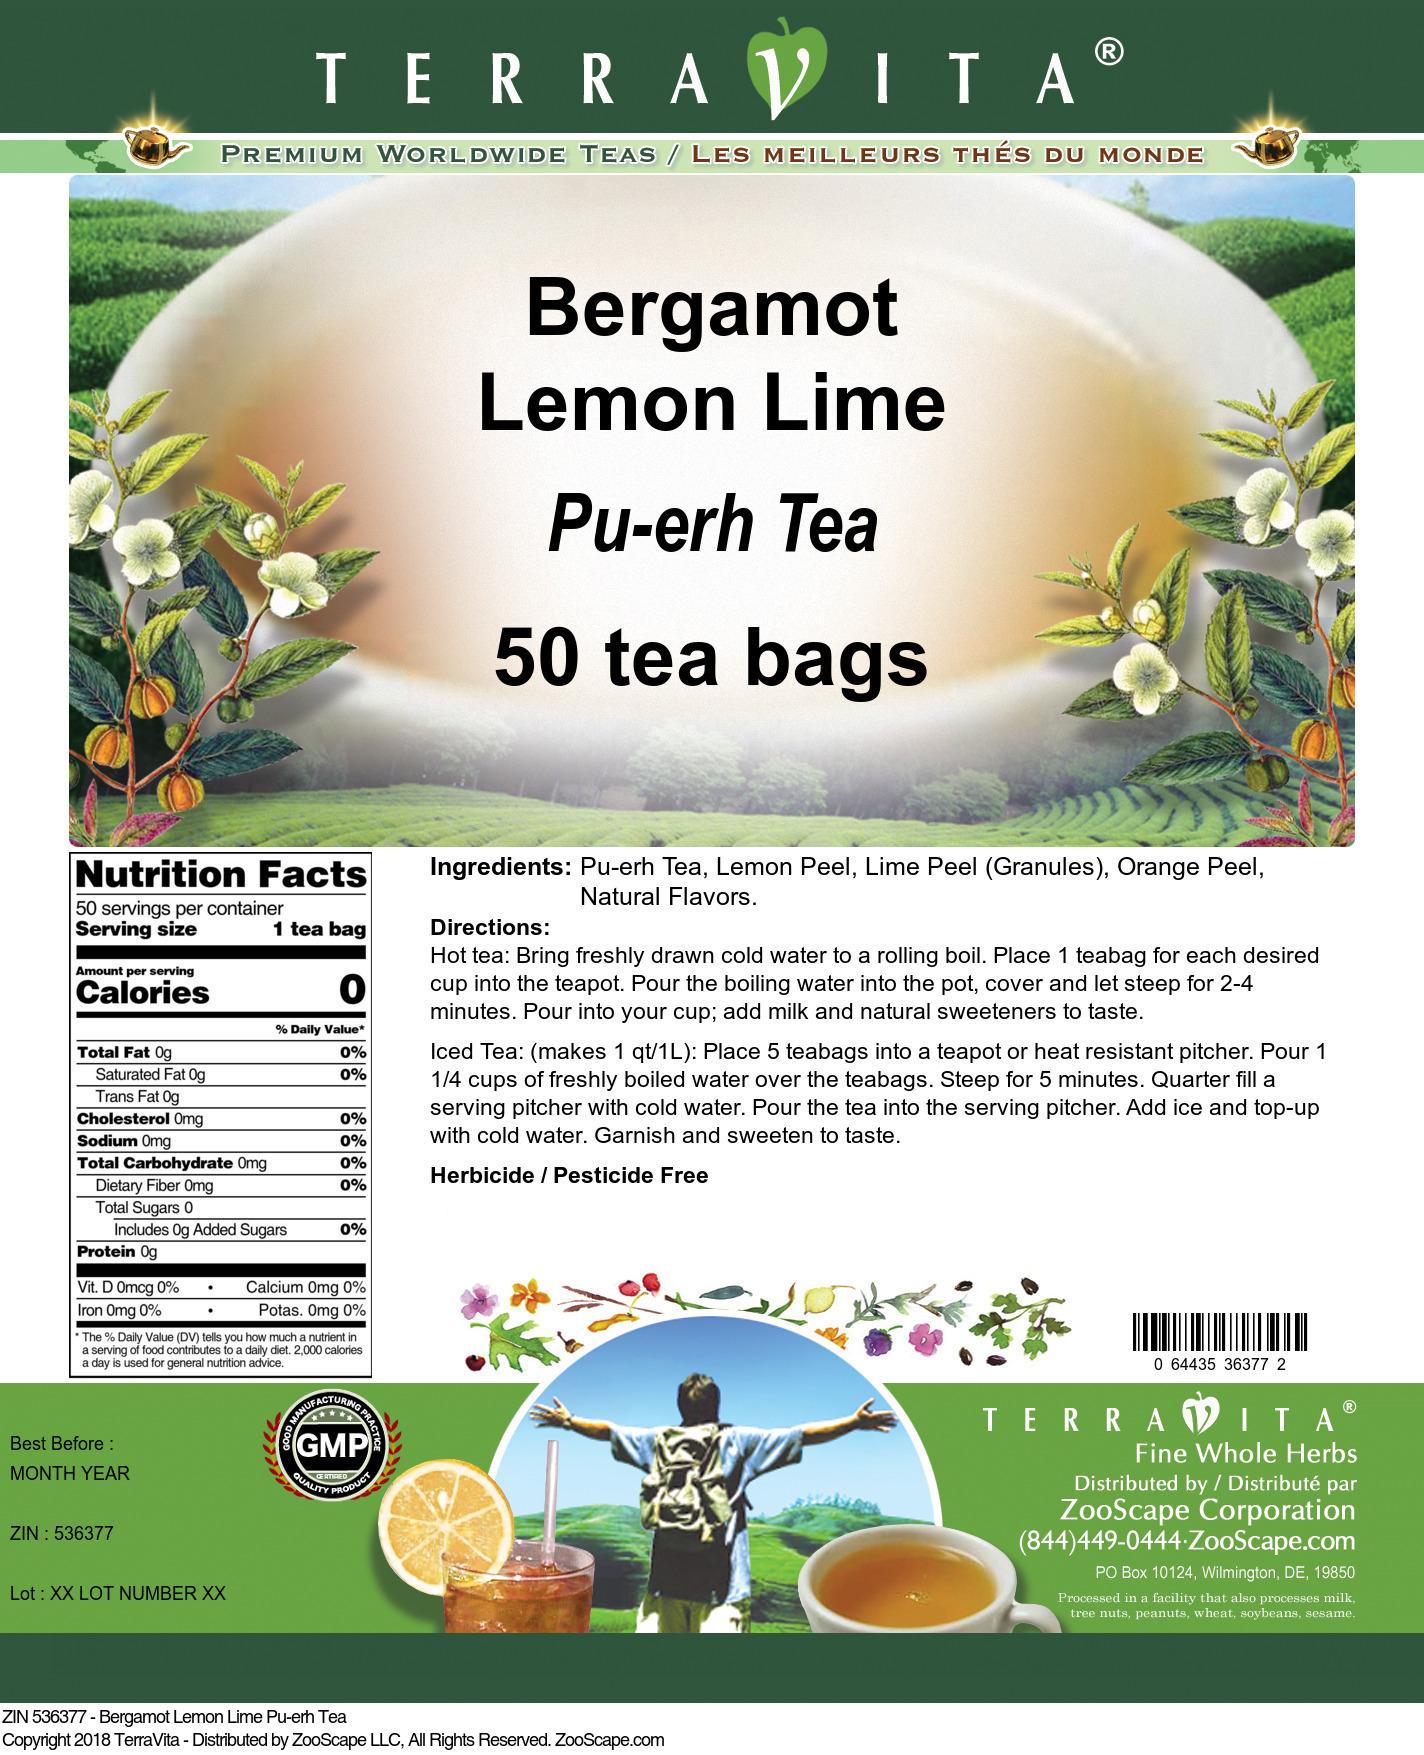 Bergamot Lemon Lime Pu-erh Tea